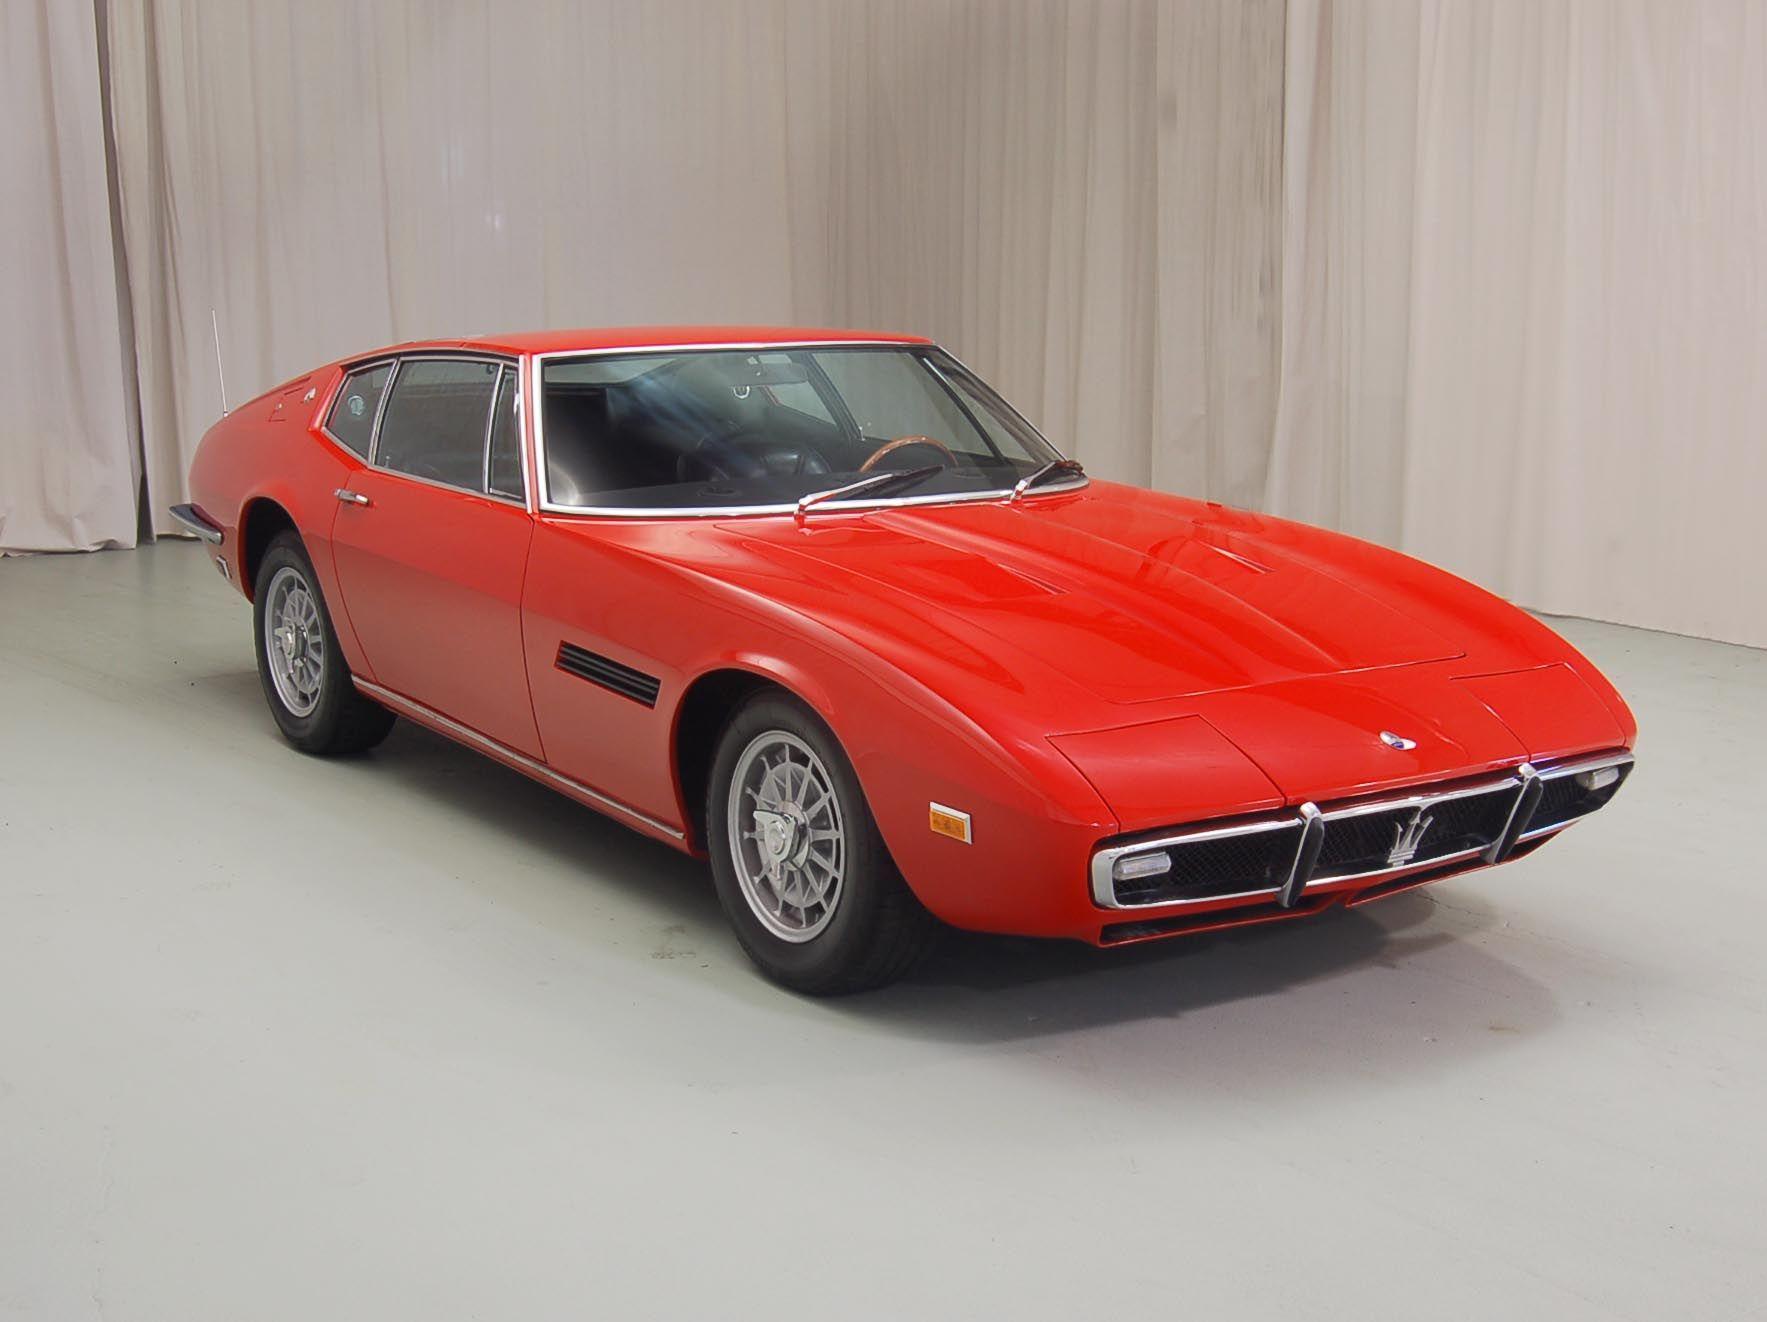 1964 Maserati Mistral Coupe For Sale Rear   Maserati   Pinterest ...